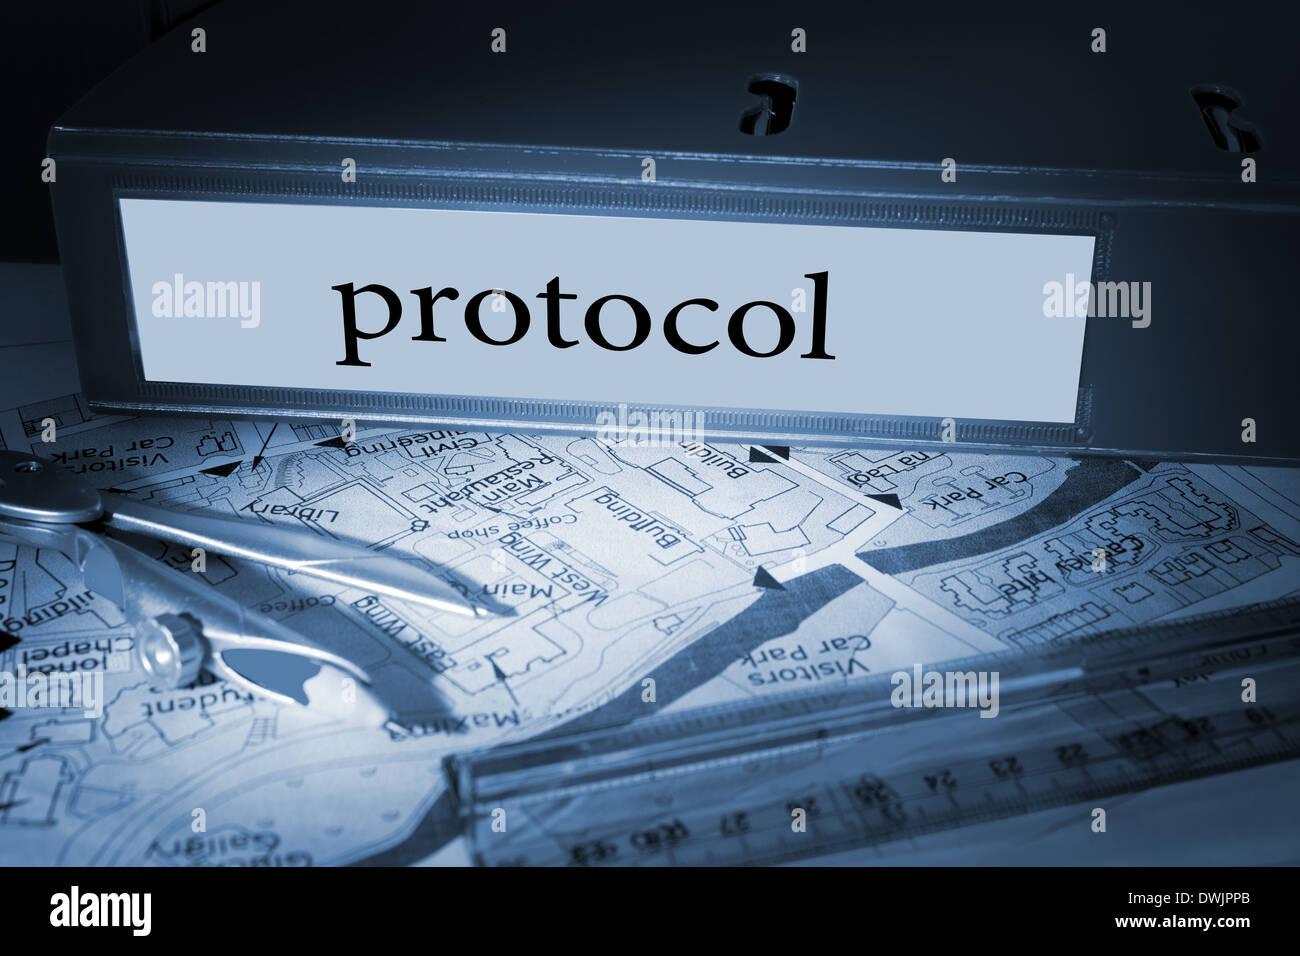 Protocol on blue business binder - Stock Image